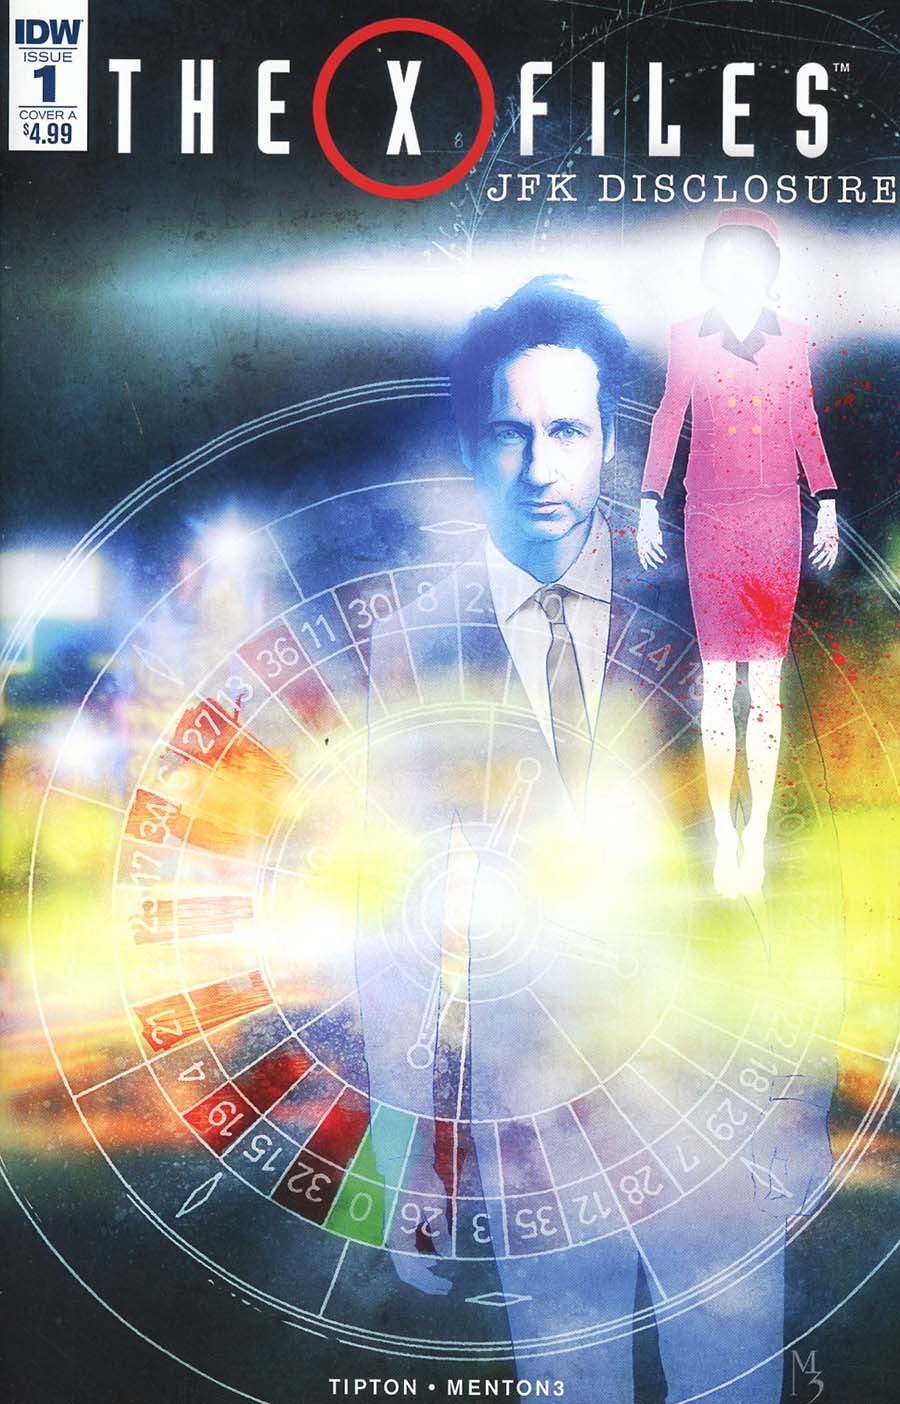 X-Files JFK Disclosure #1 Cover A Regular Menton3 Cover